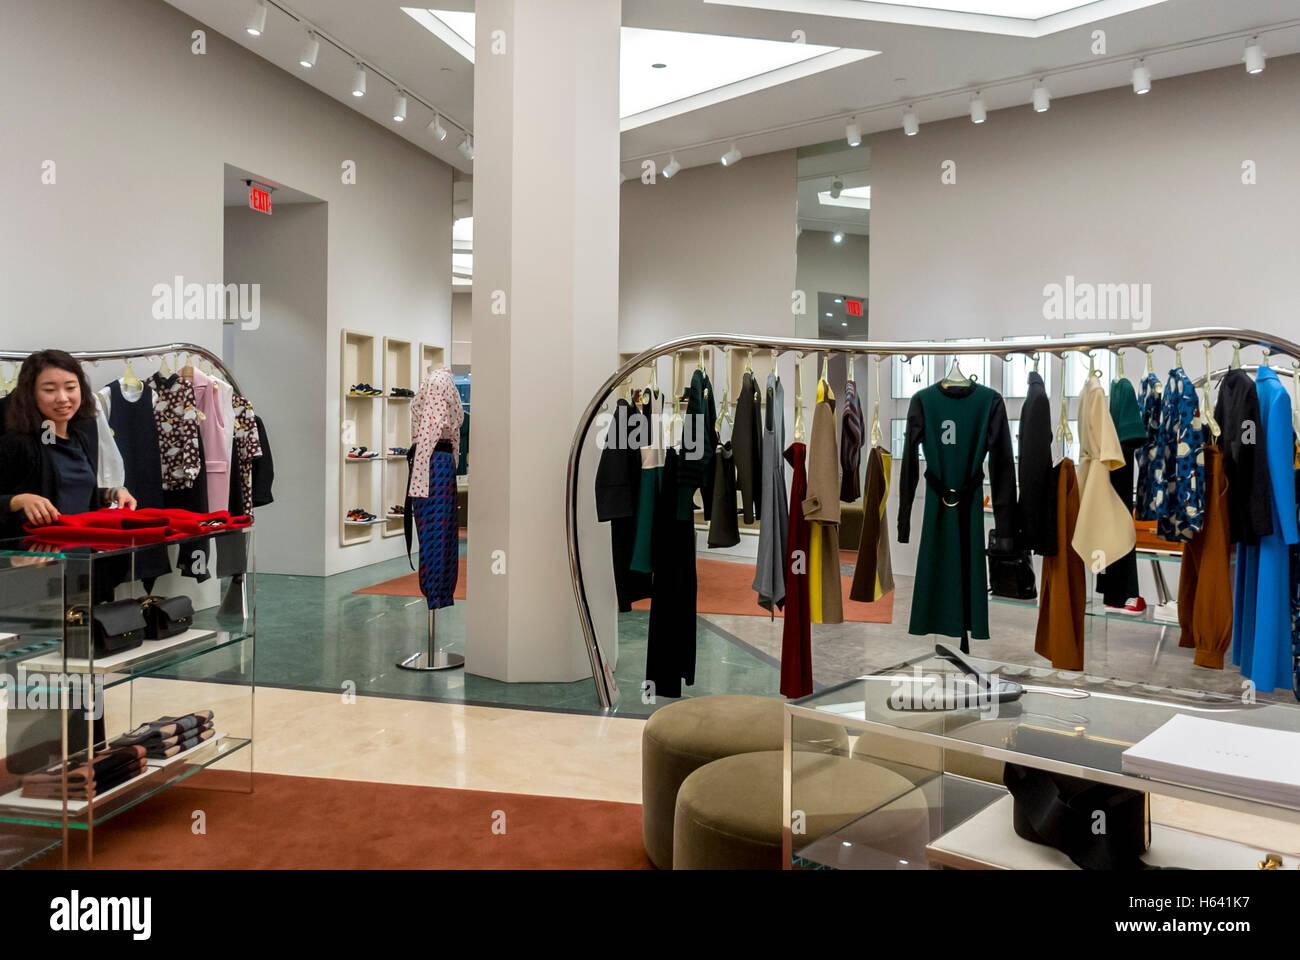 San Francisco Ca Usa Clothing Store Interior Clothes On Display Stock Photo Alamy